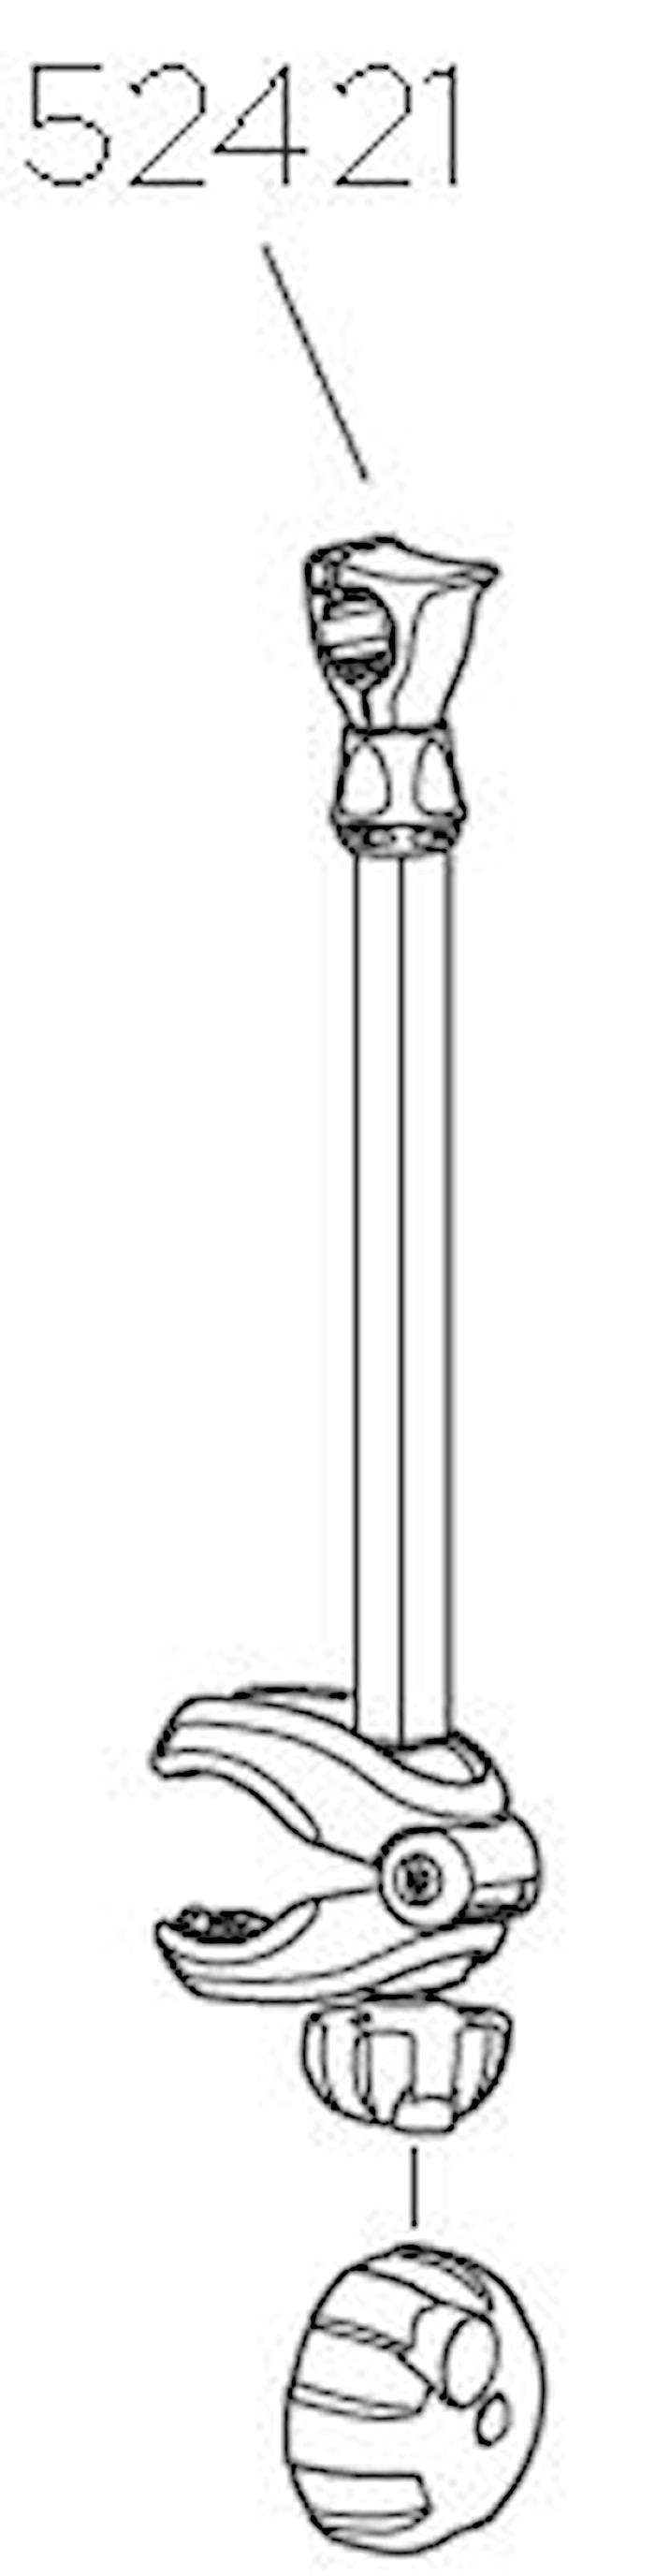 Hållararm 482 mm